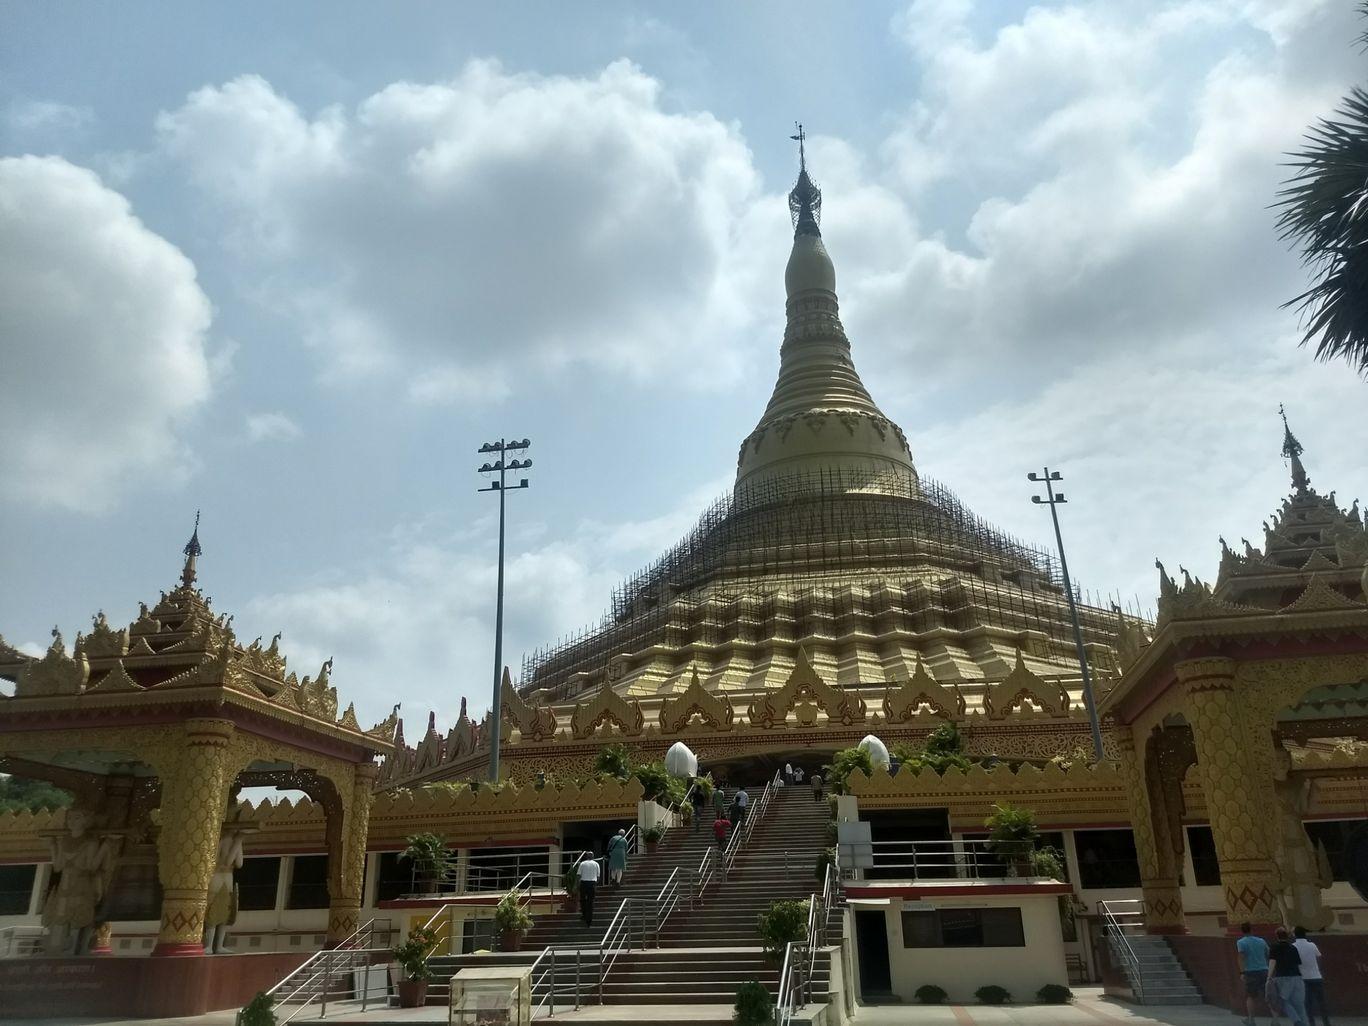 Photo of Global Vipassana Pagoda By Vish Mondal